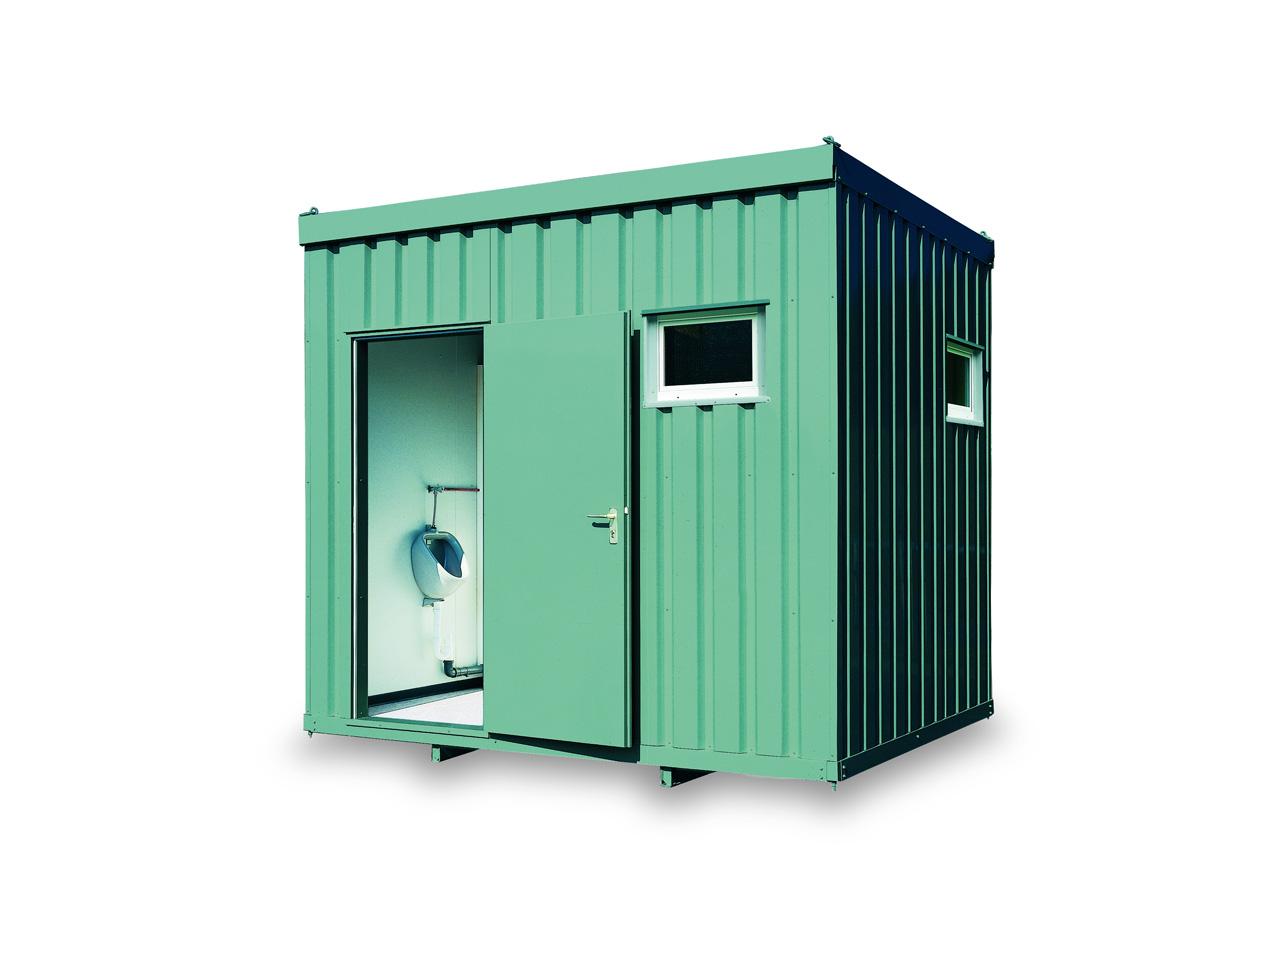 fladafi containerbau sc 3852 3 m container kaufen. Black Bedroom Furniture Sets. Home Design Ideas